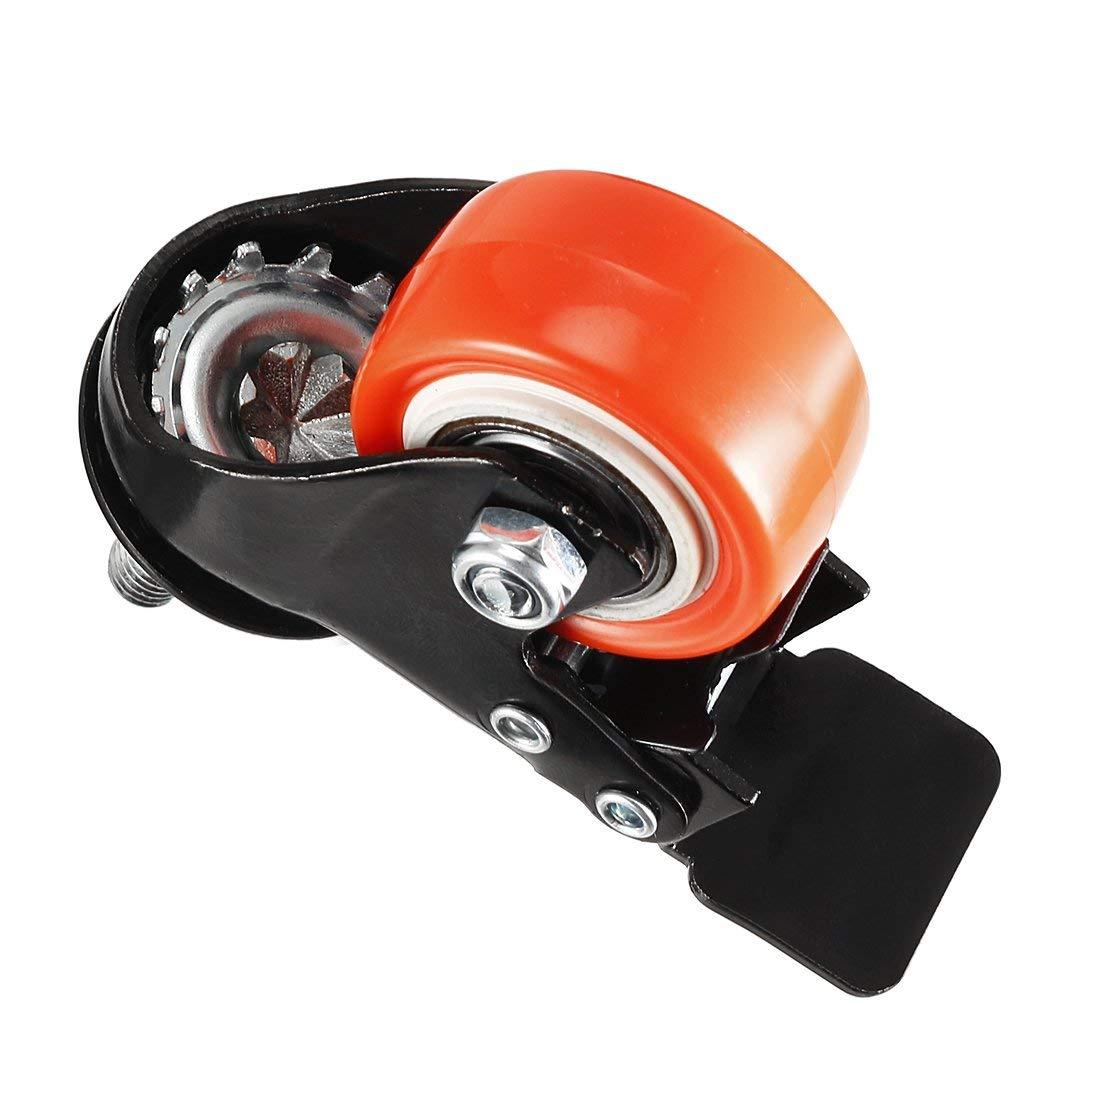 ZCHXD 1.5 Inch Swivel Caster Wheels PU 360 Degree Threaded Stem ...